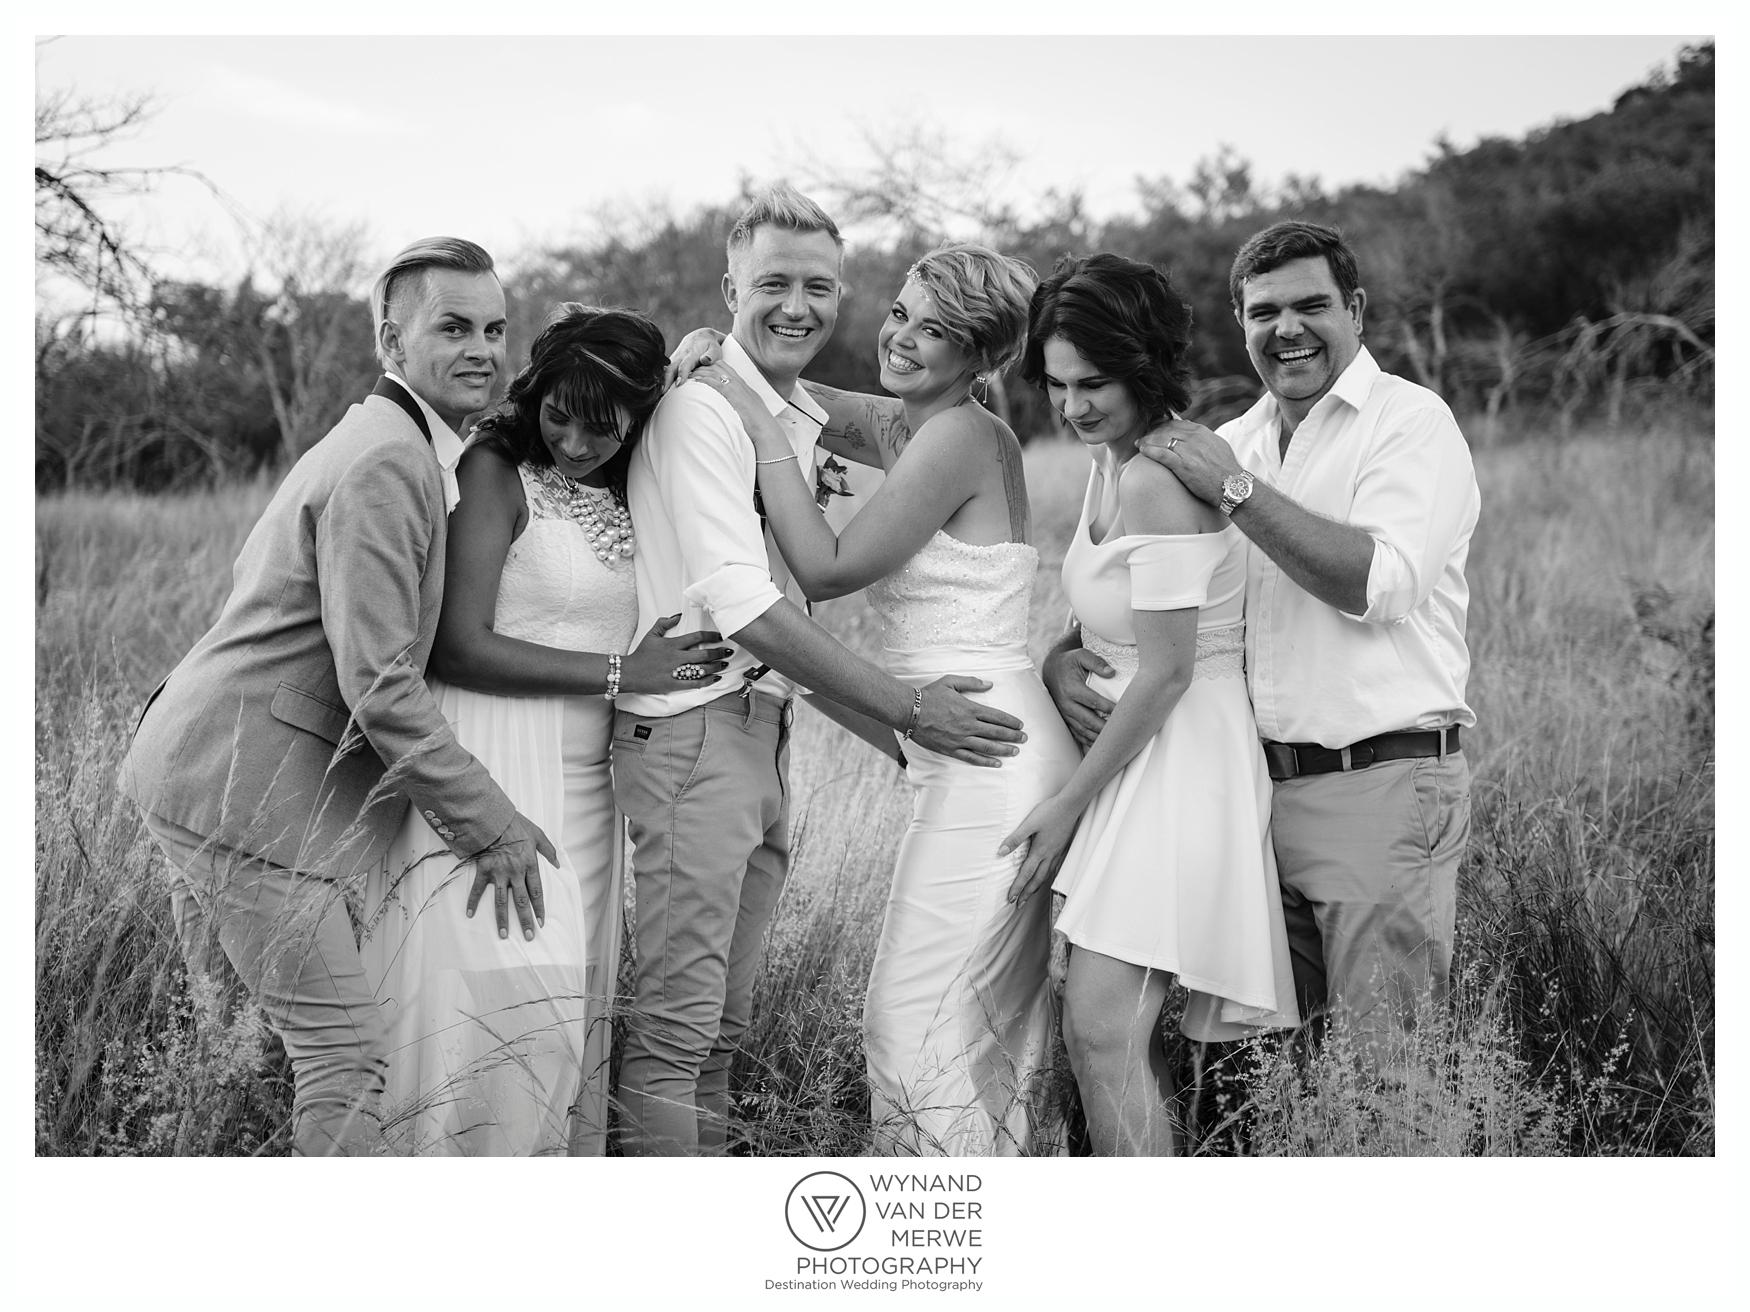 WynandvanderMerwe_weddingphotography_bushveldwedding_northam_bushveld_limpopowedding_limpopo_southafrica-178.jpg